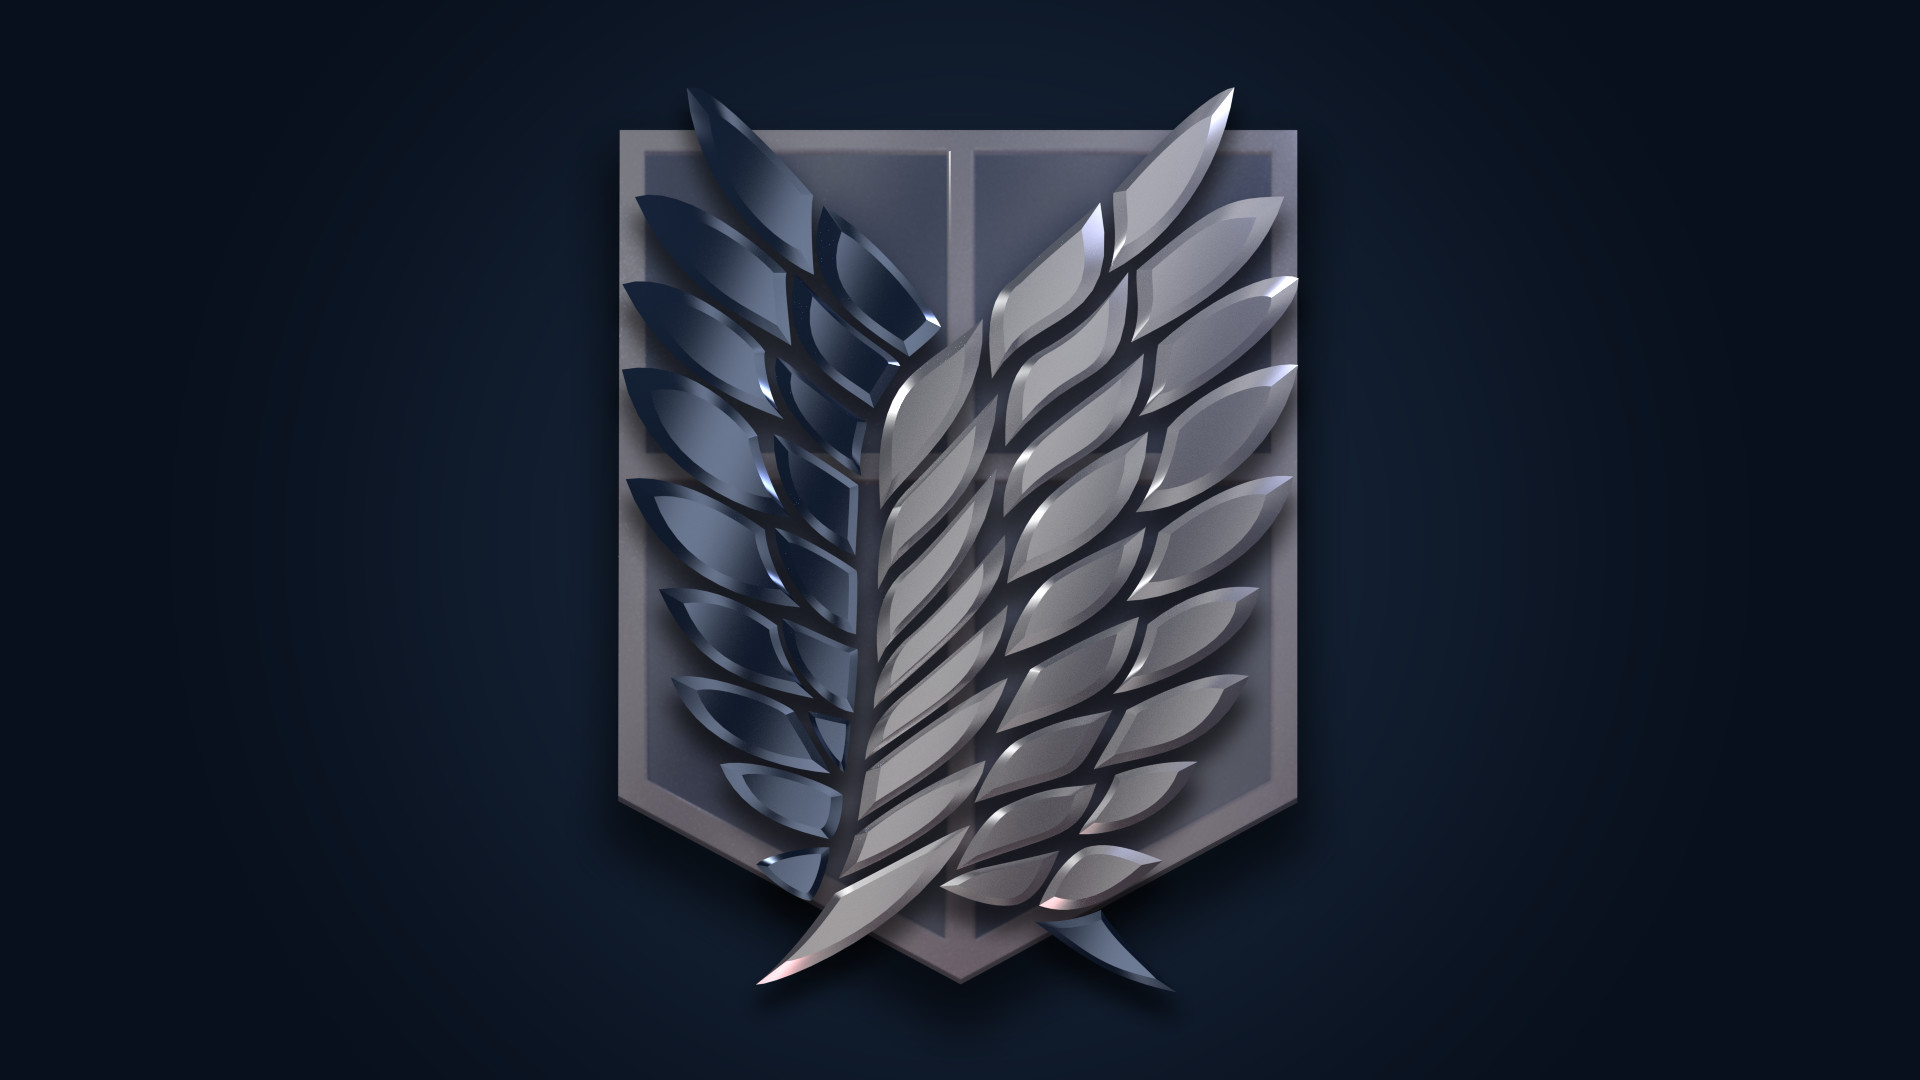 69 Attack On Titan Logo